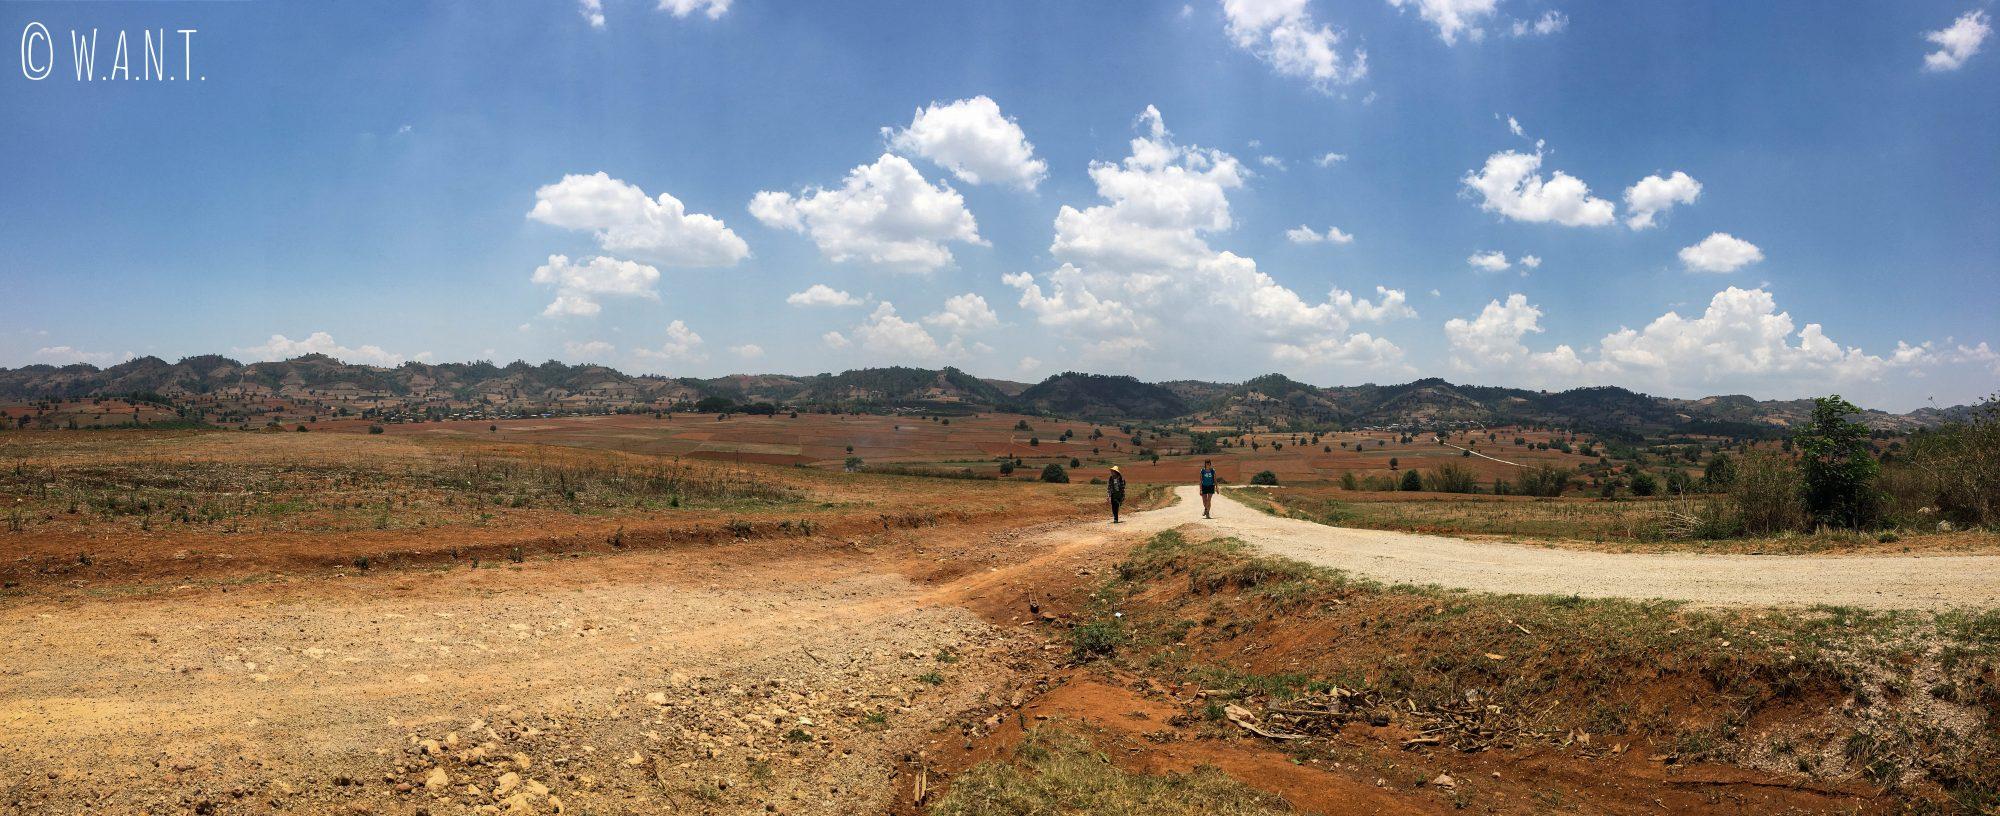 Panorama de ce deuxième jour de trek